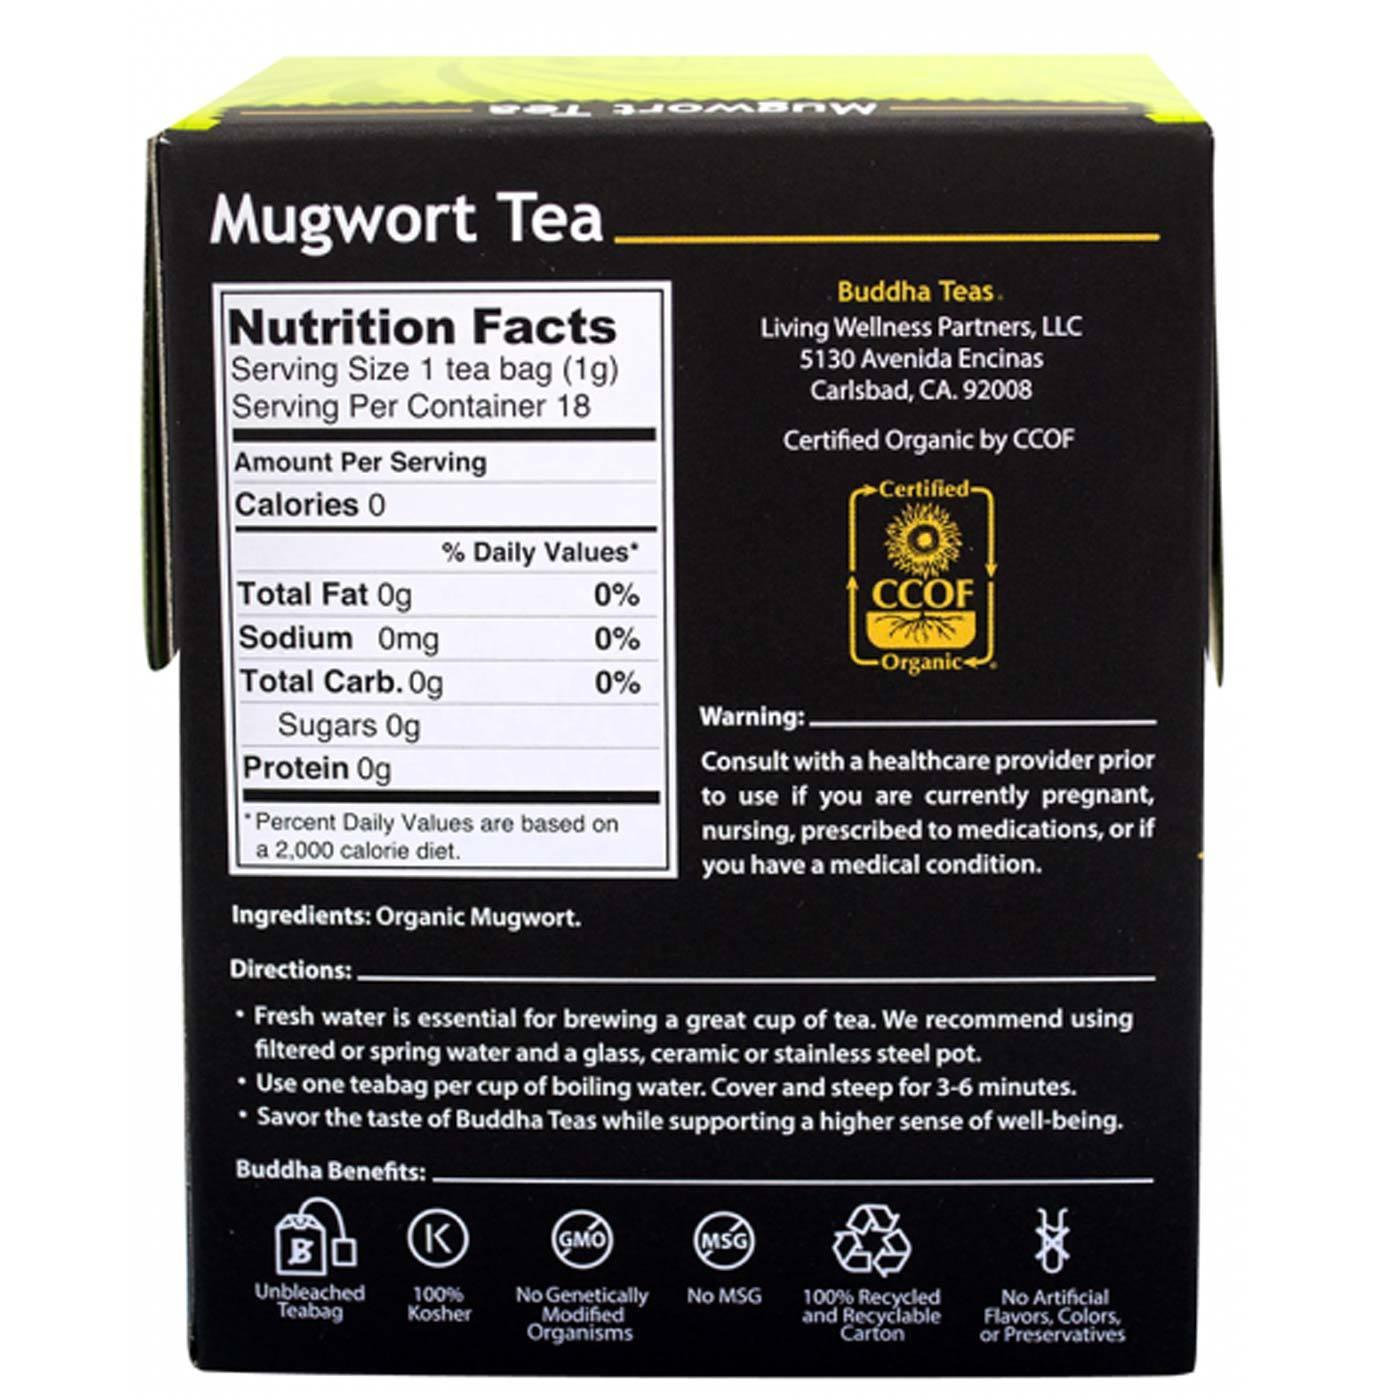 Buddha Teas Herbal Tea Mugwort - 18 bags